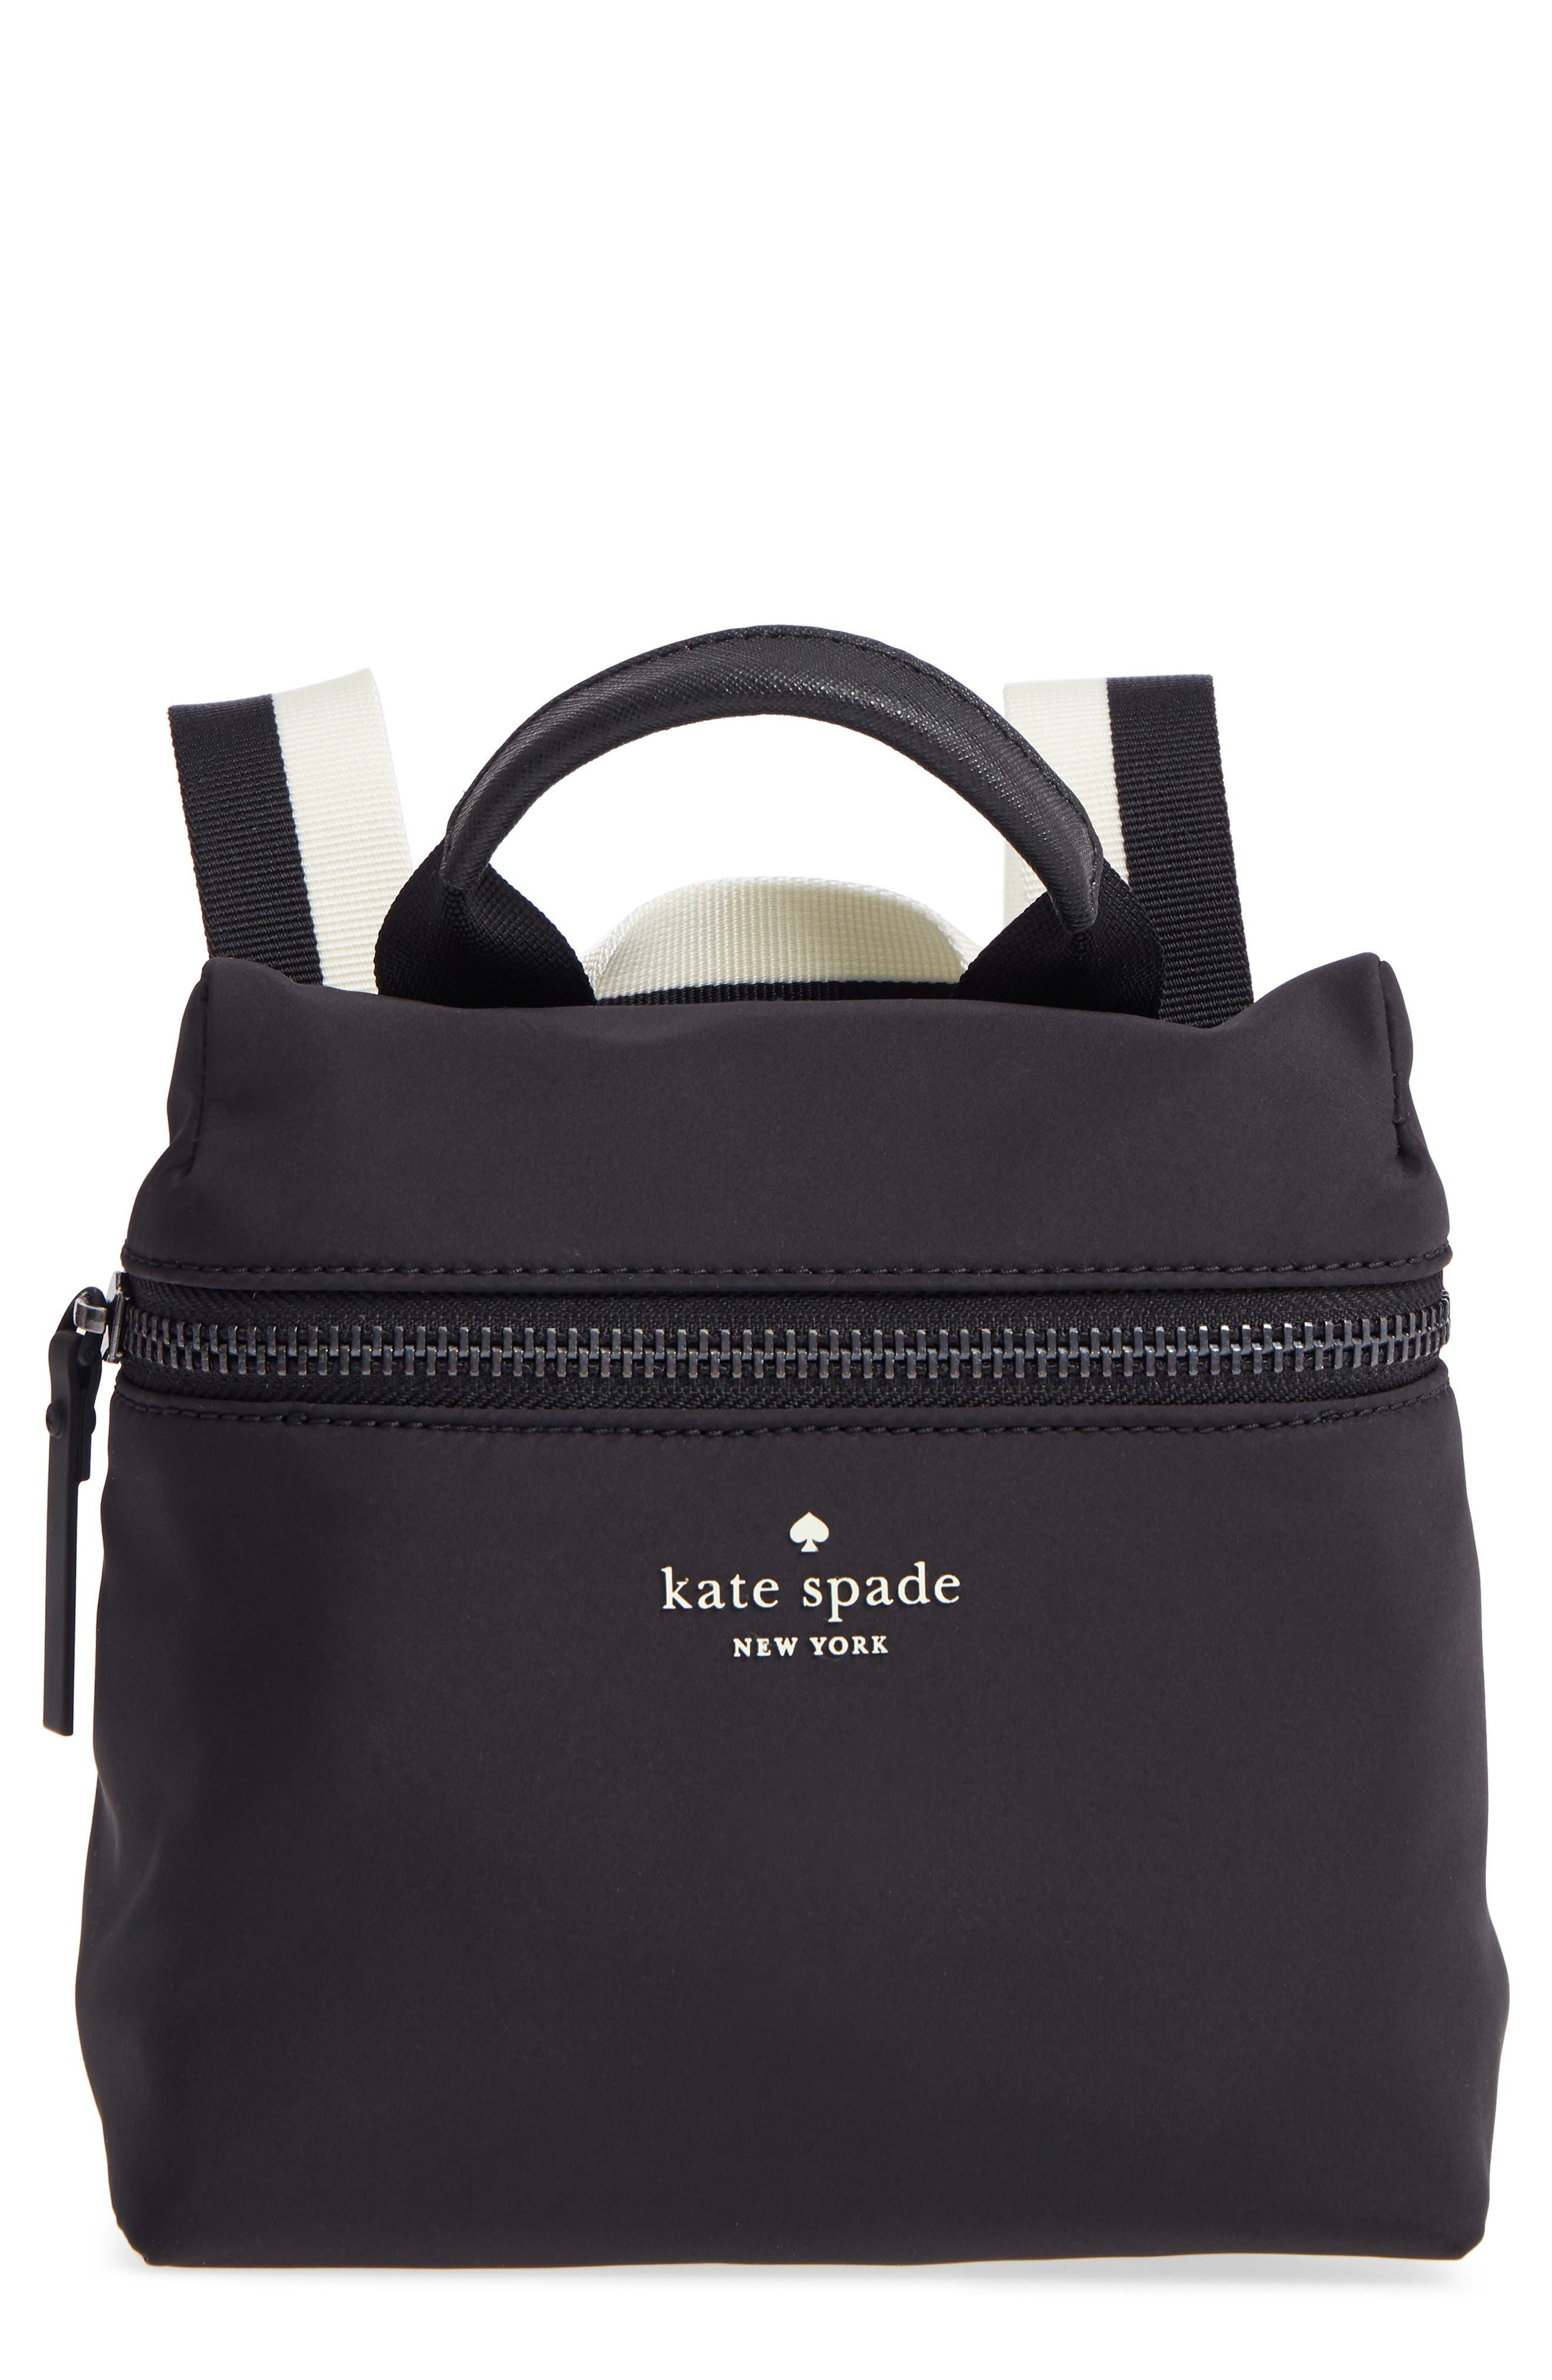 kate spade new york that's the spirit mini nylon crossbody bag